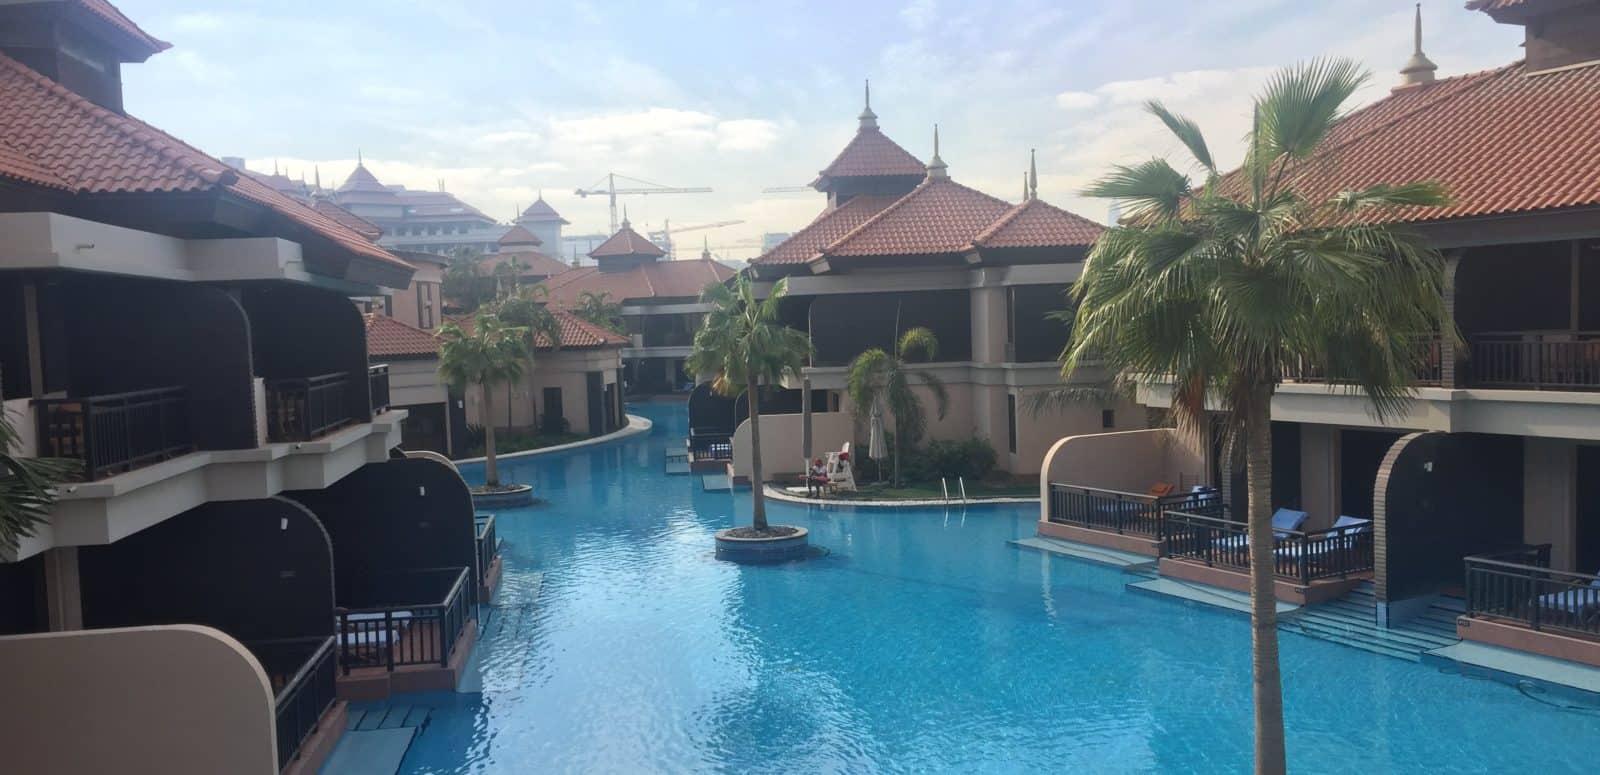 reiseblogonline-Ausblick-hotel -anantara-Lagoon-Zimmer-dubai